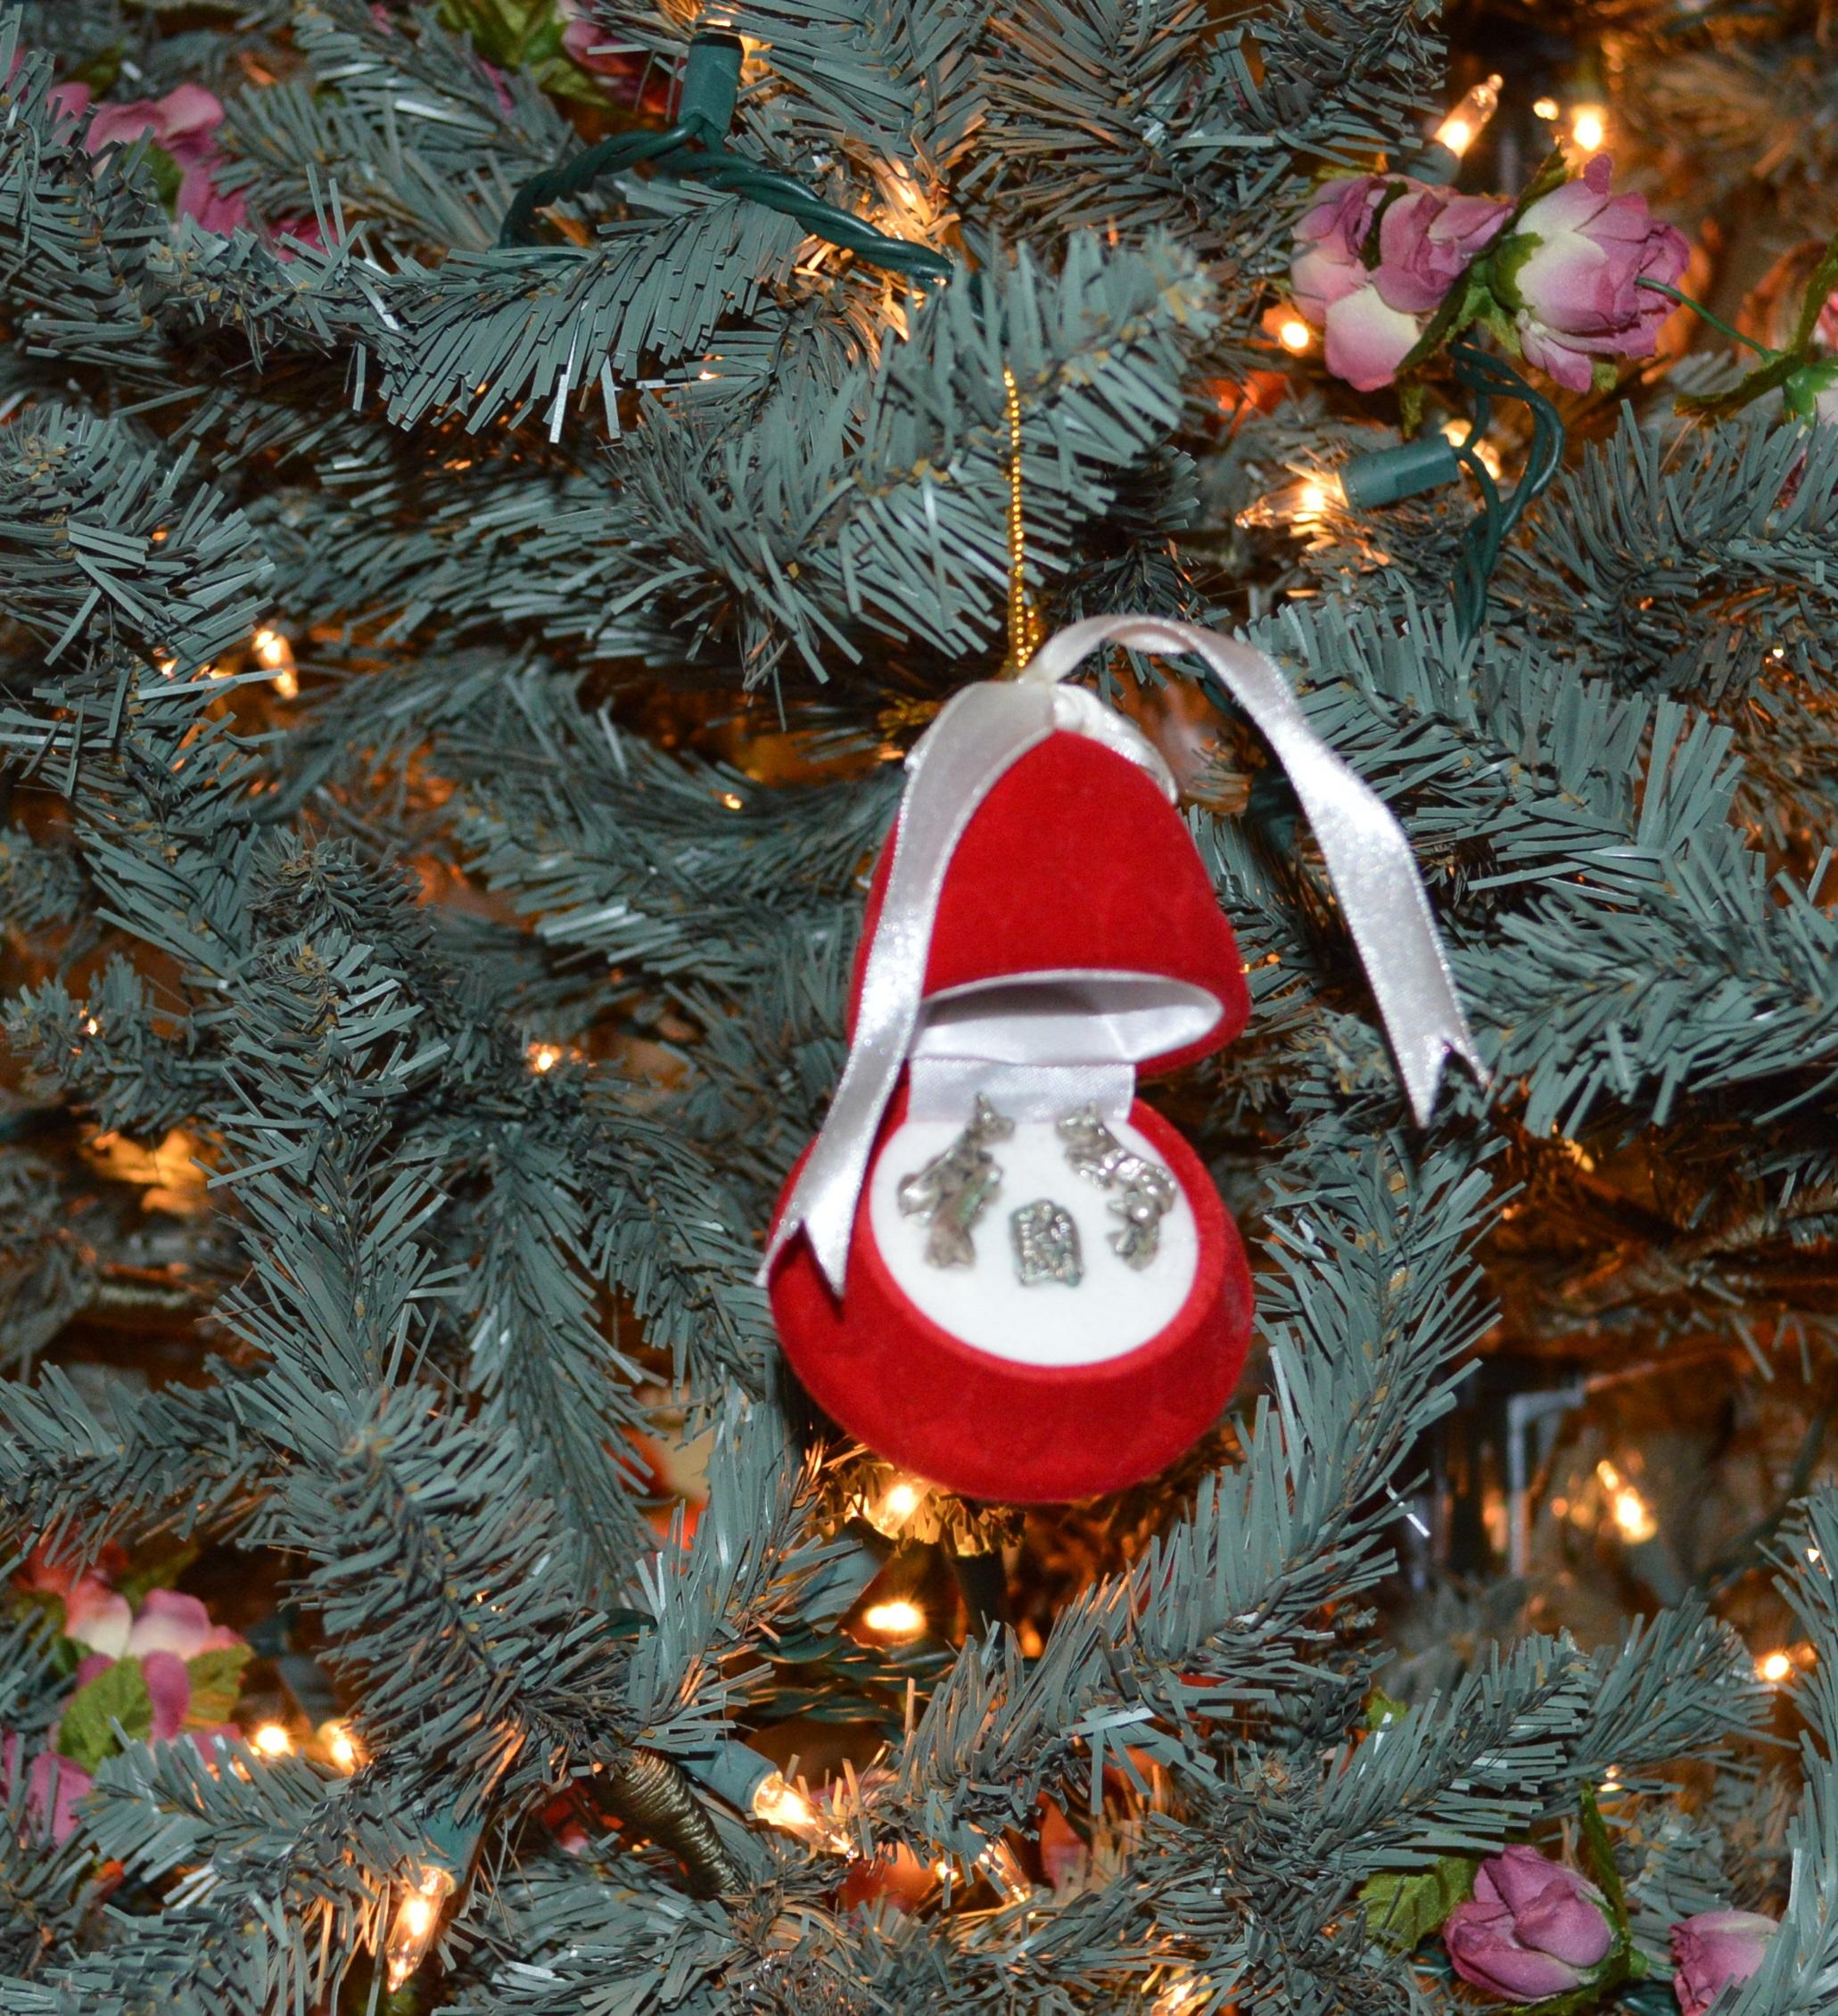 Hummel christmas tree ornaments - Nativitygail Nativitygaileurope Sarahmoscowballet